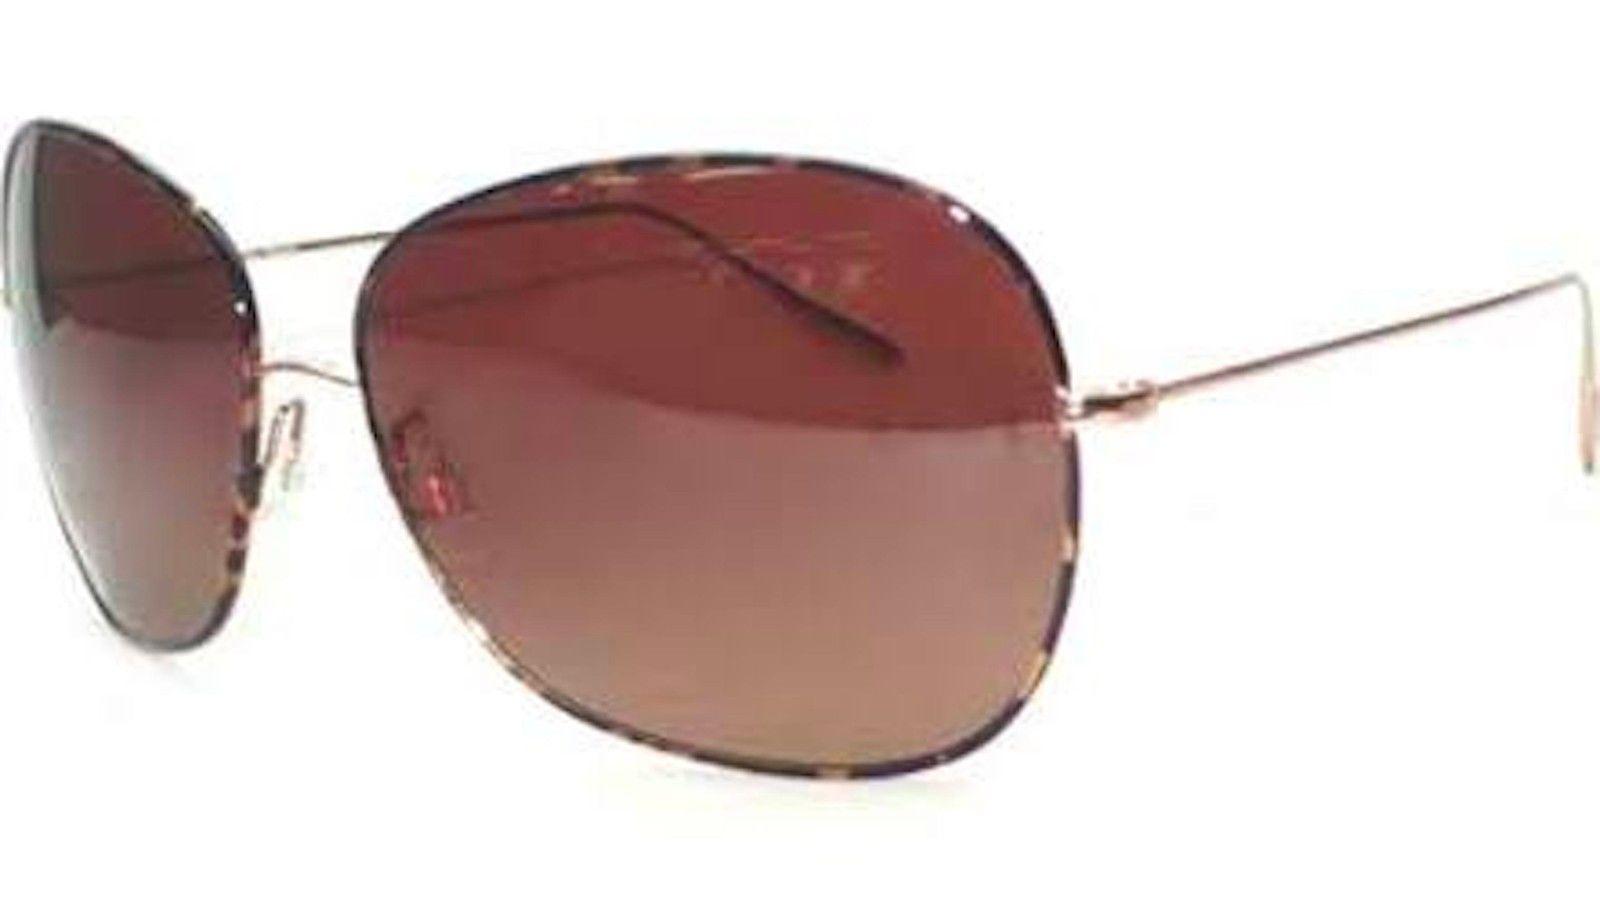 053a3cad1f Oliver Peoples Sunglasses - Luxury Designerware Sunglasses